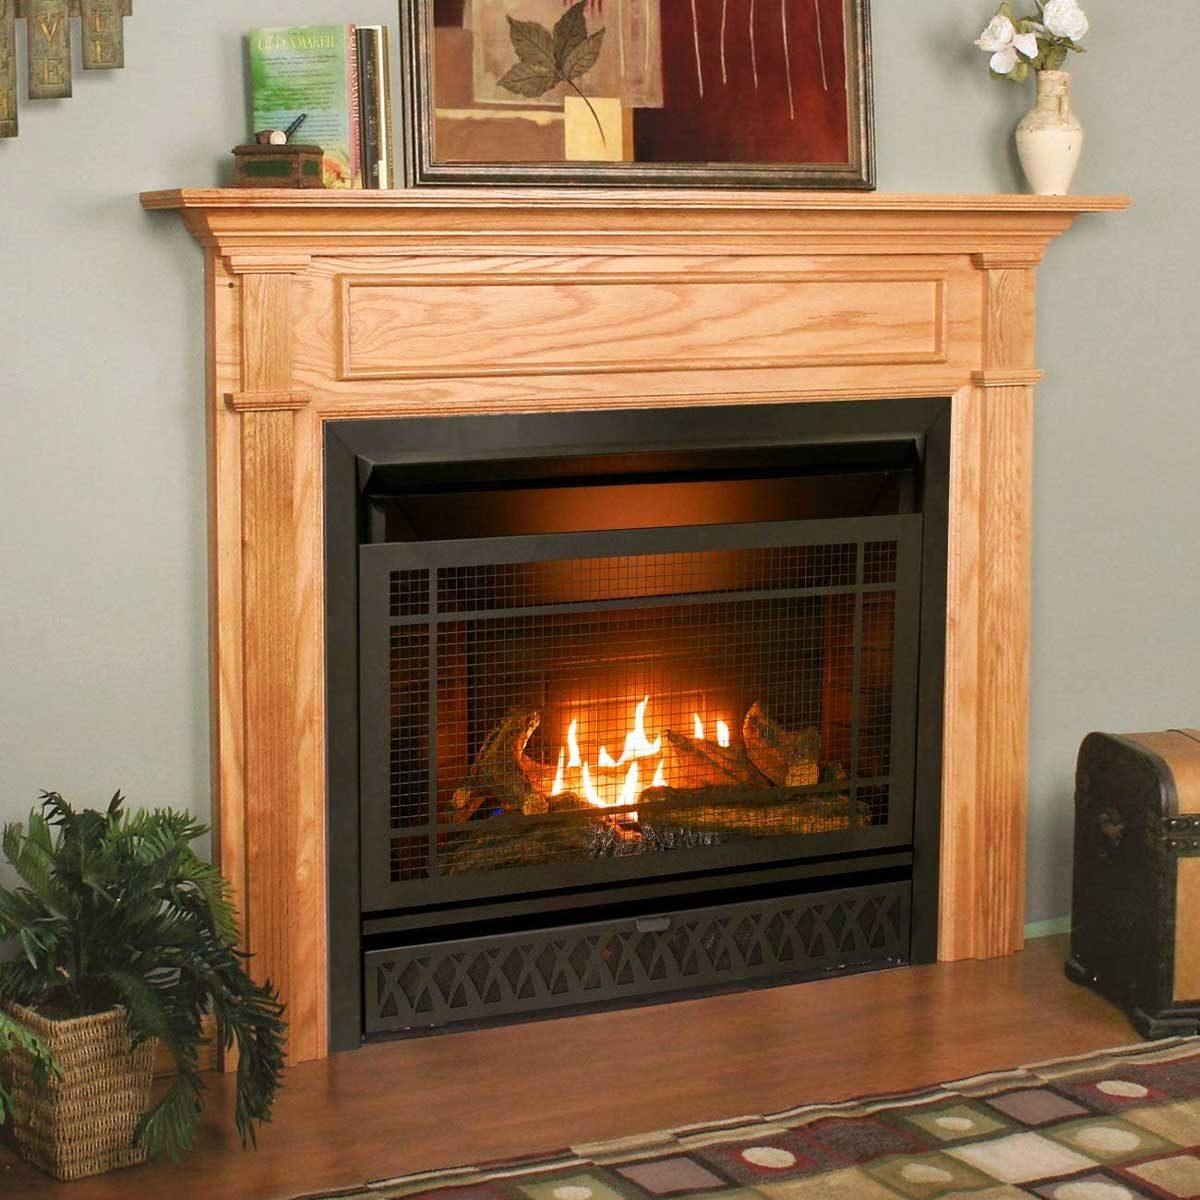 Gas Fireplace Insert 71av4ww6r2l. Ac Sl1300